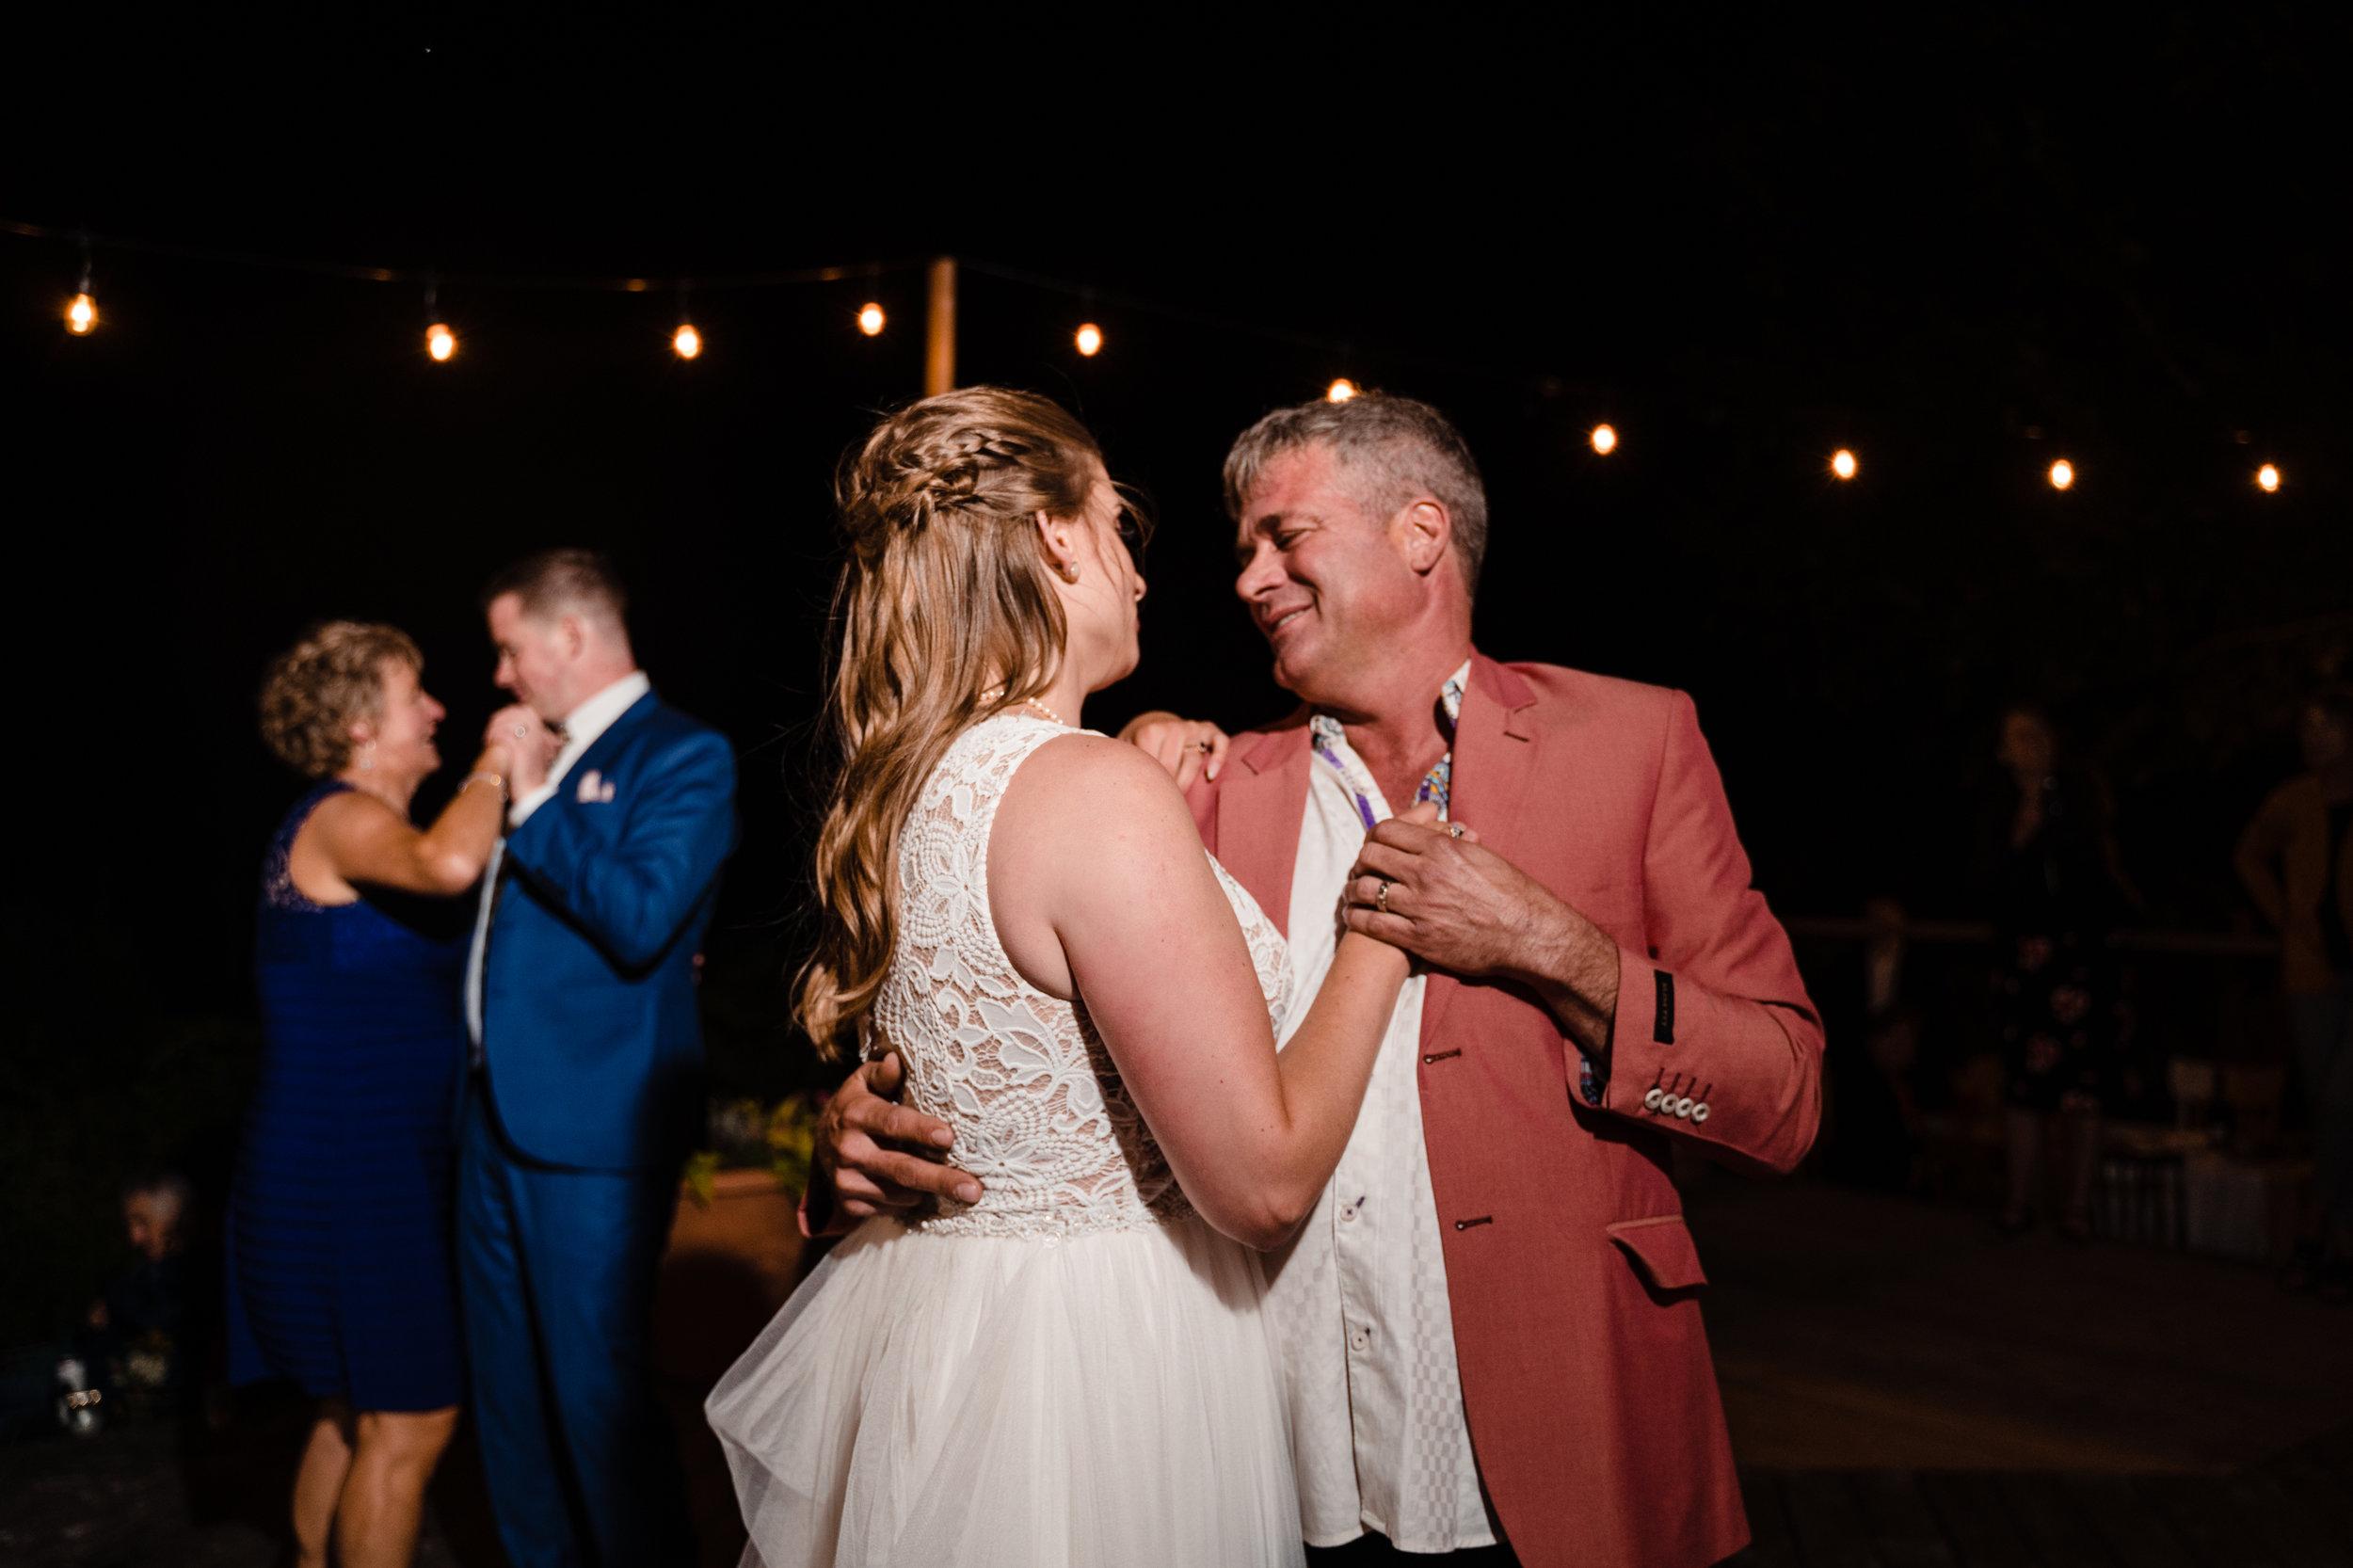 Janelle-Mitch-Halifax-Wedding-Nova-Scotia-Photography (149 of 163).jpg